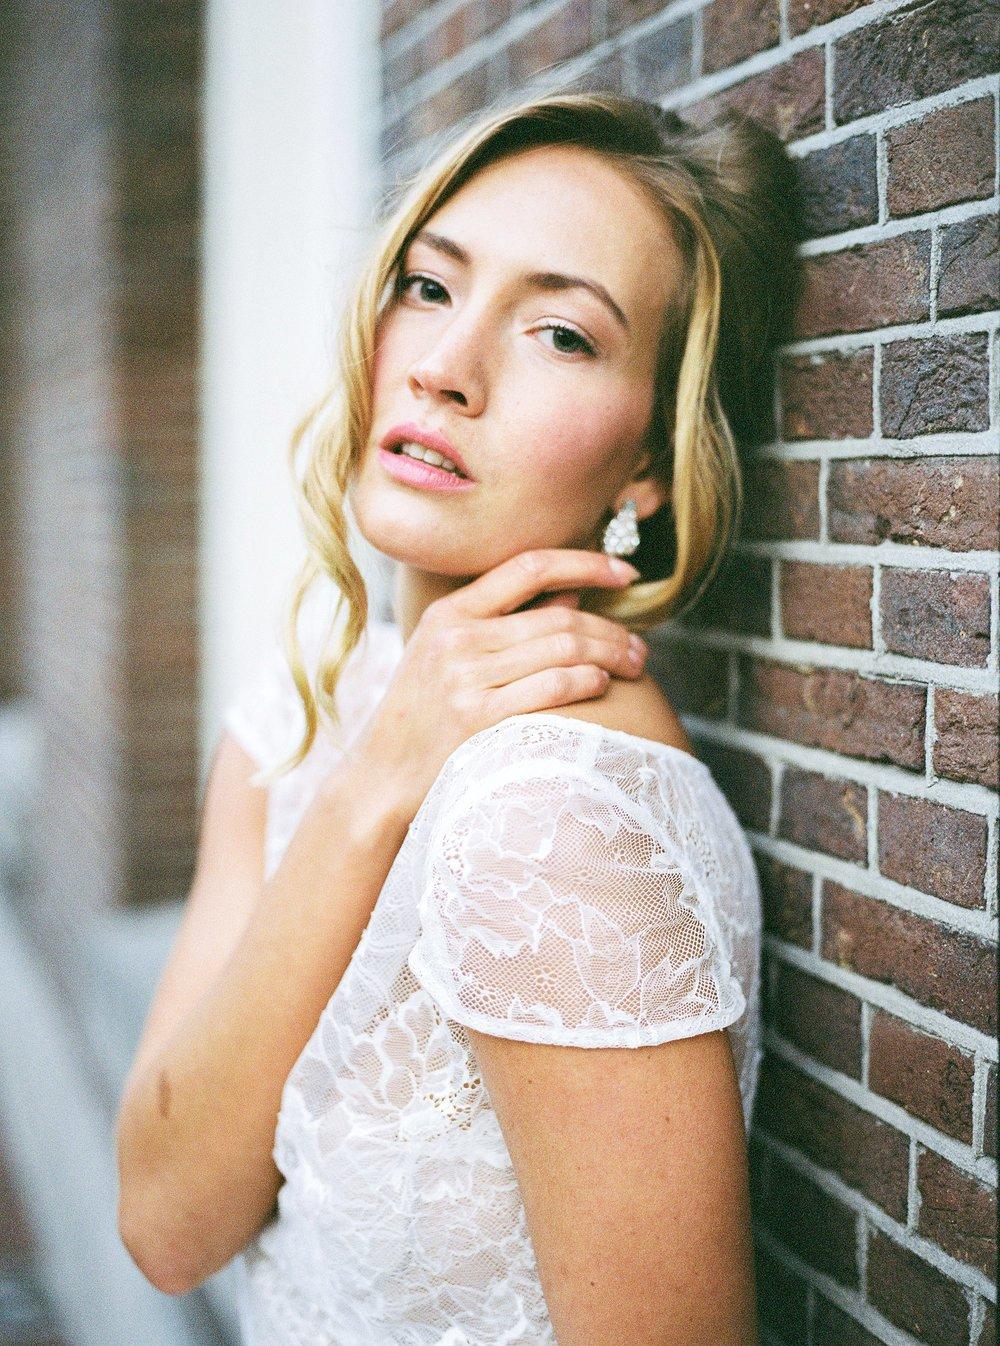 Amanda-Drost-Photography-fotografie-bruiloft-trouwen-winter-TheNetherlands_0083.jpg